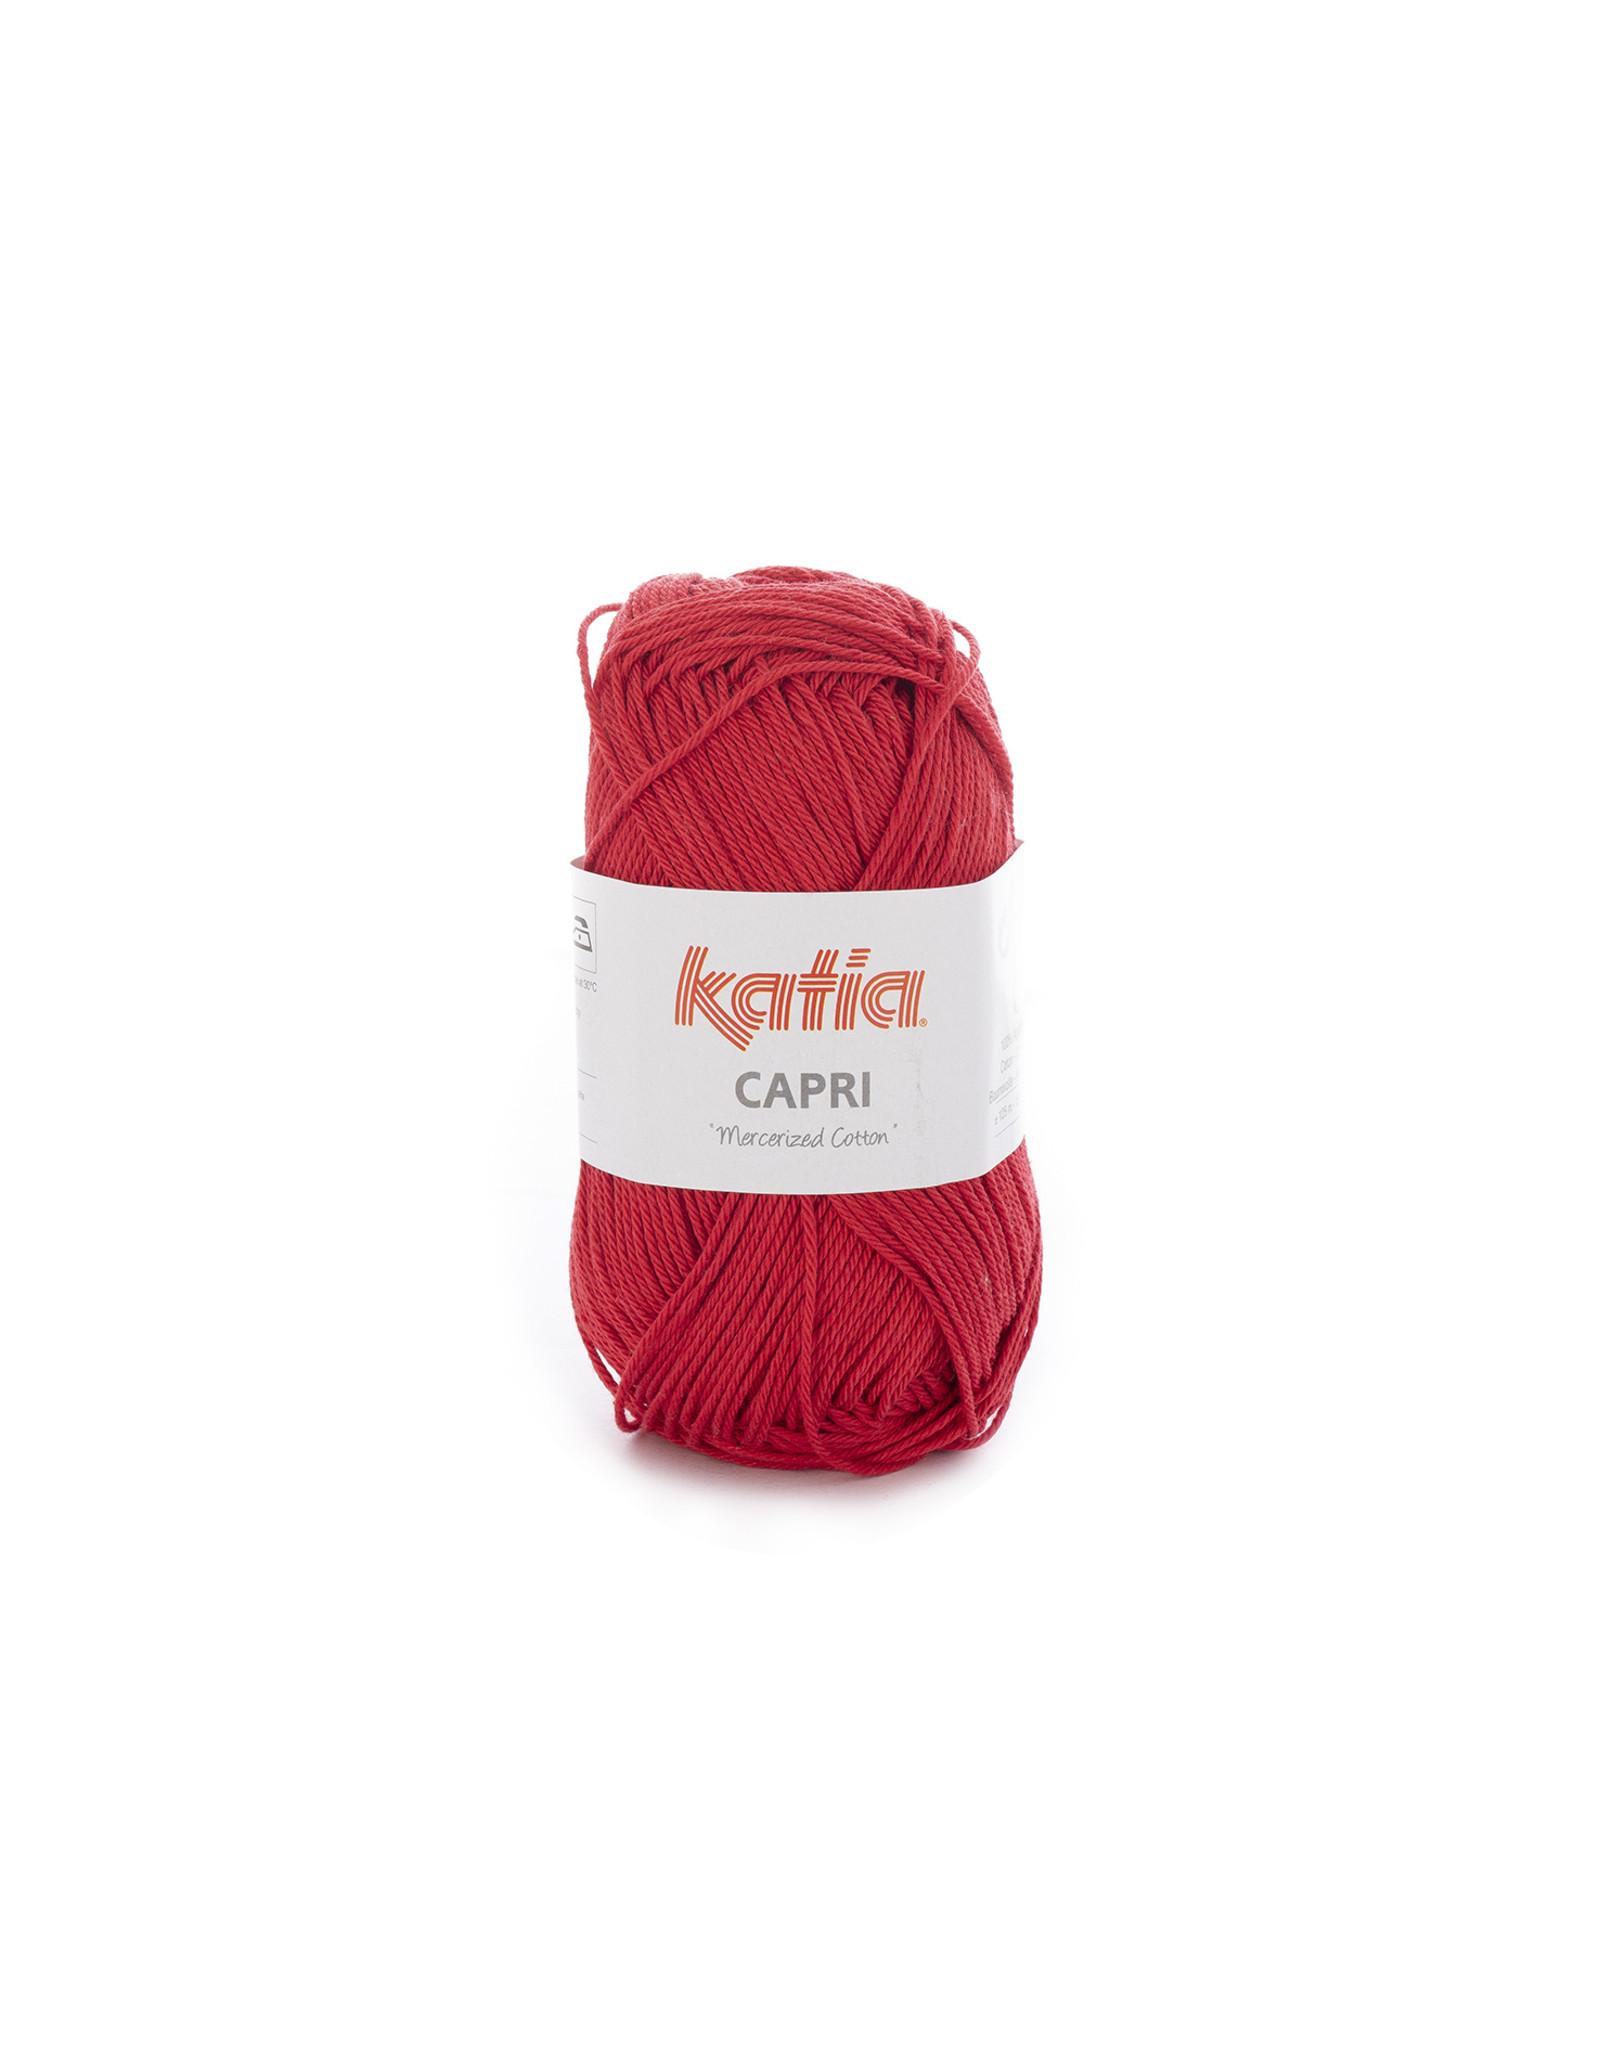 Katia Katia Capri - kleur 59 Rood - 50 gr. = 125 m. - 100% katoen